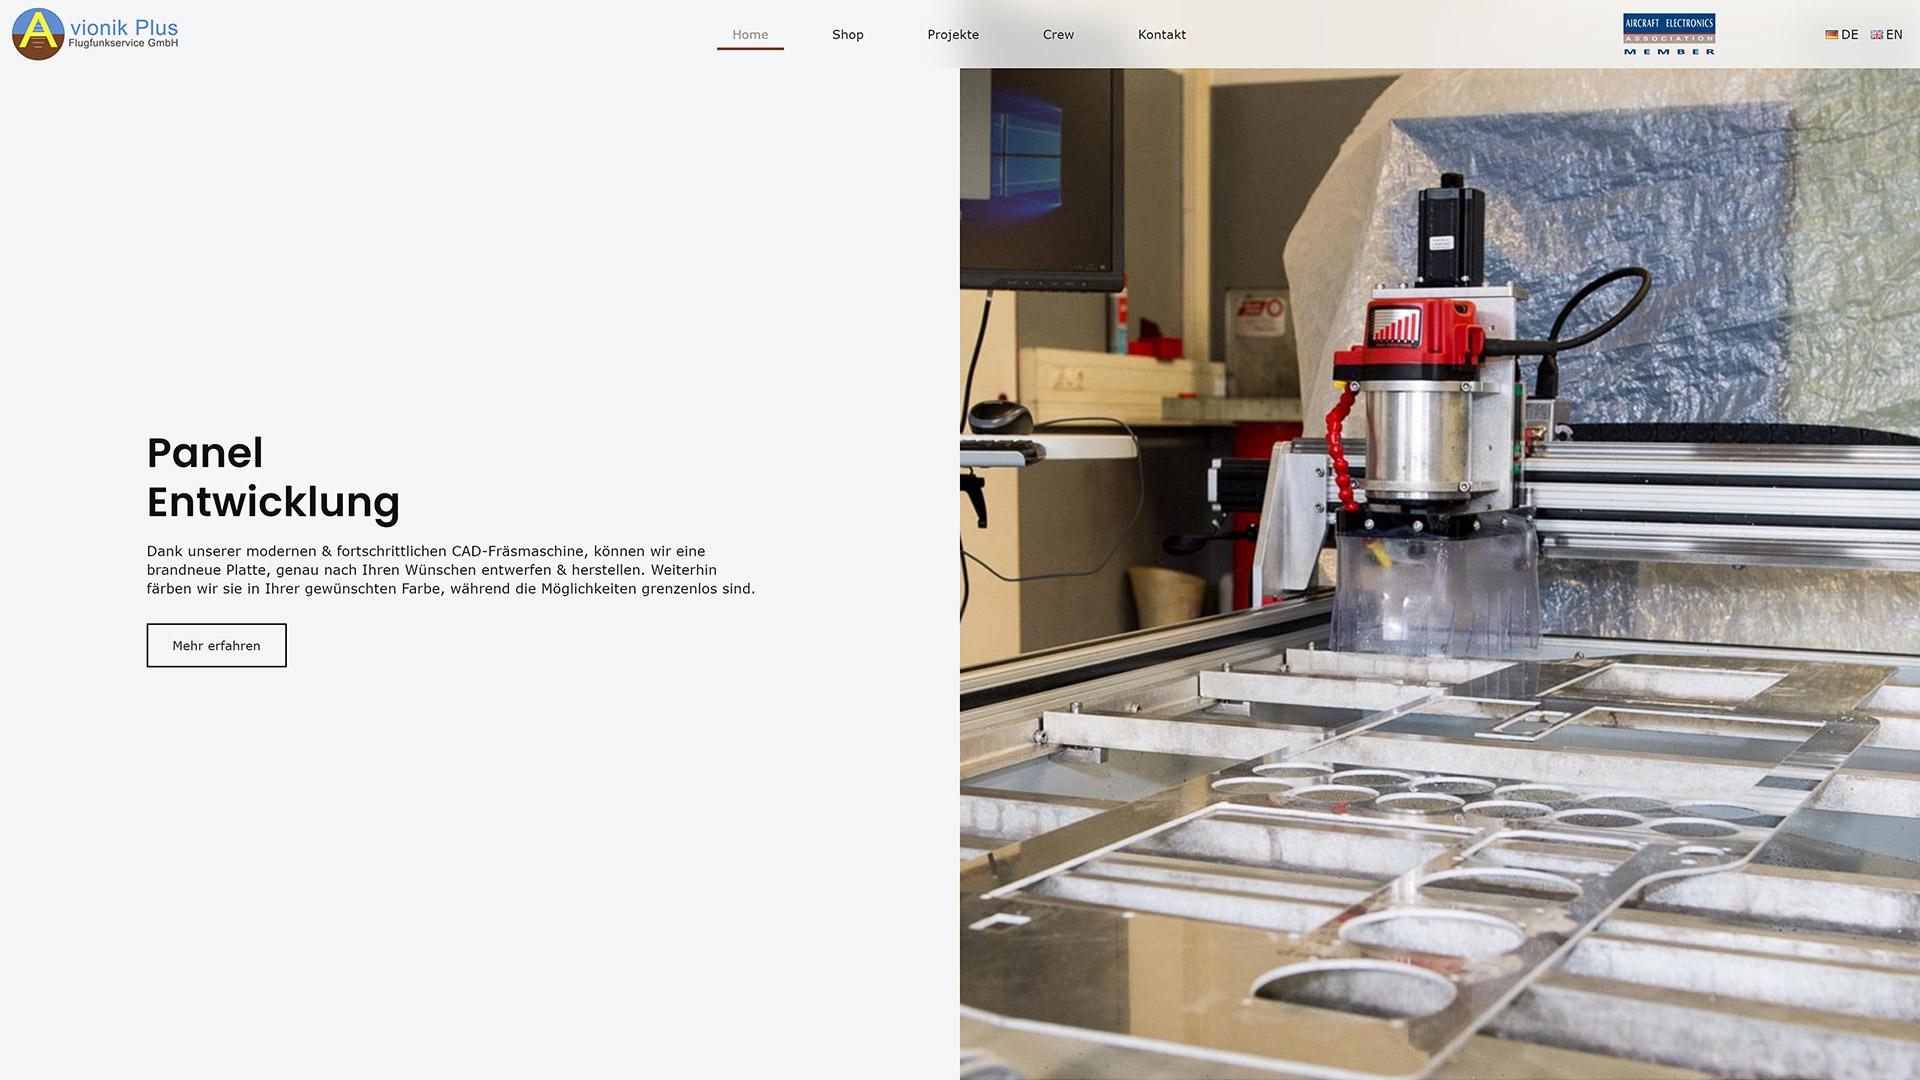 Projekt-Avionik-Plus-Showcase-1